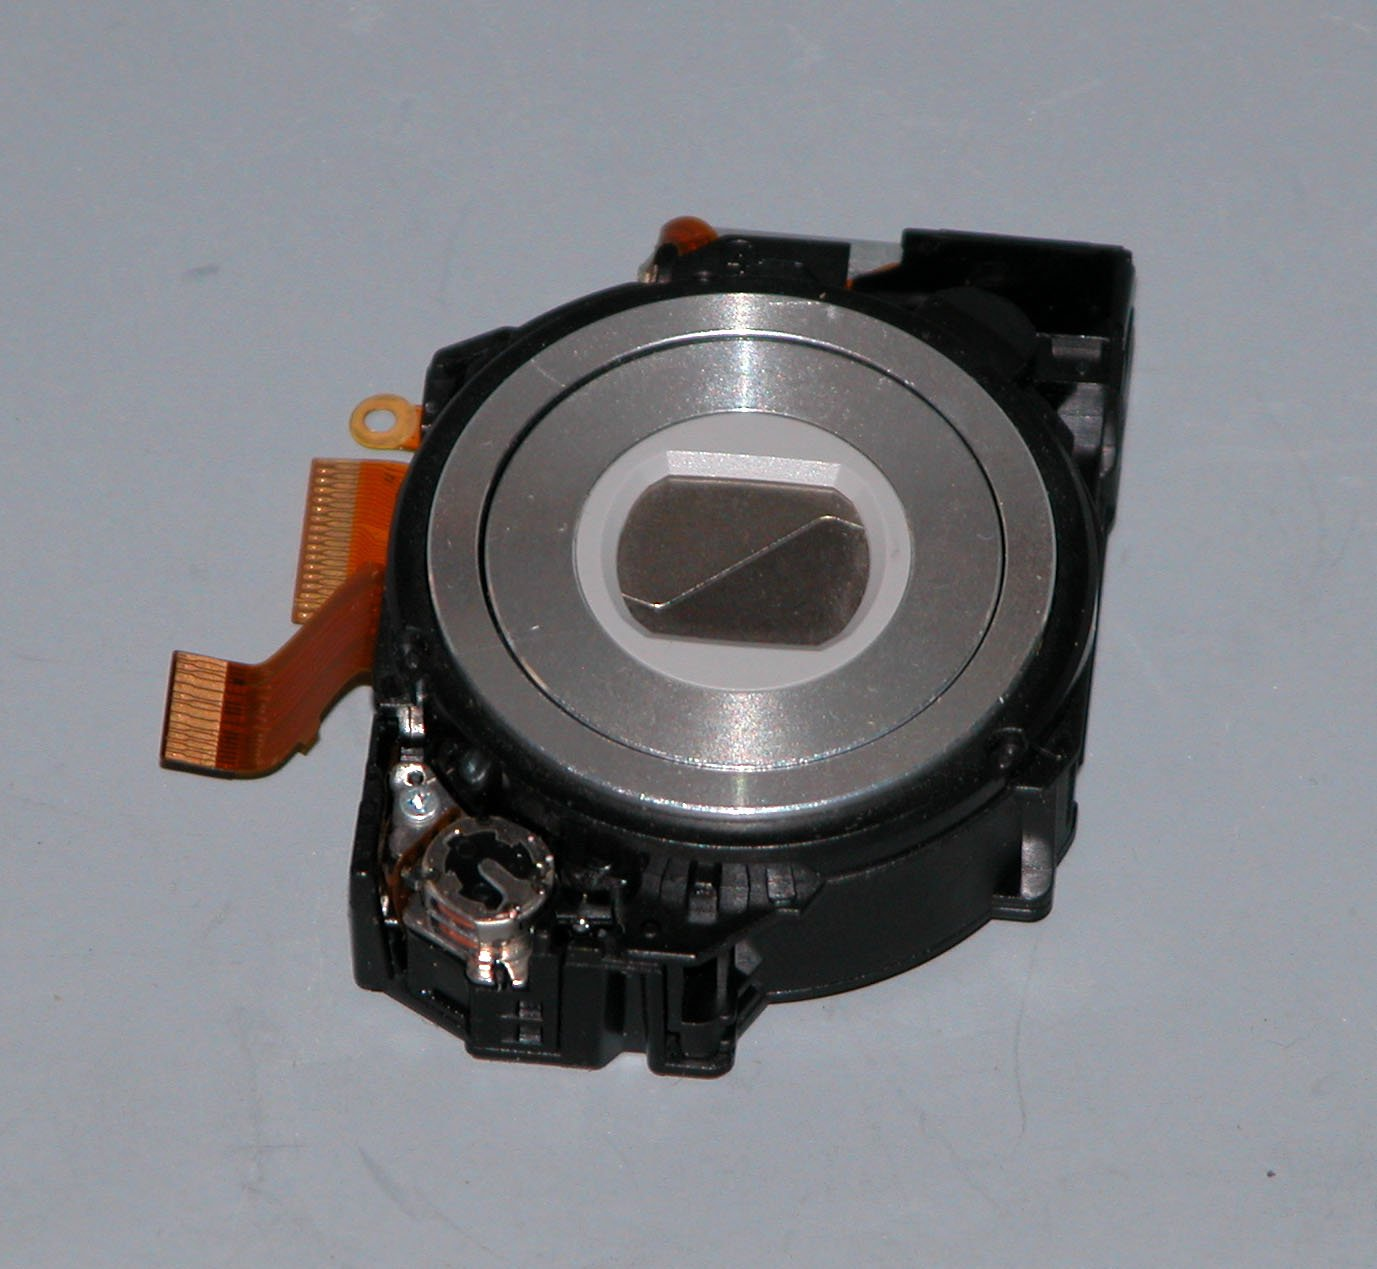 Sony Cyber-shot DSC-W510 Lens Unit with CCD Sensor - Repair Parts